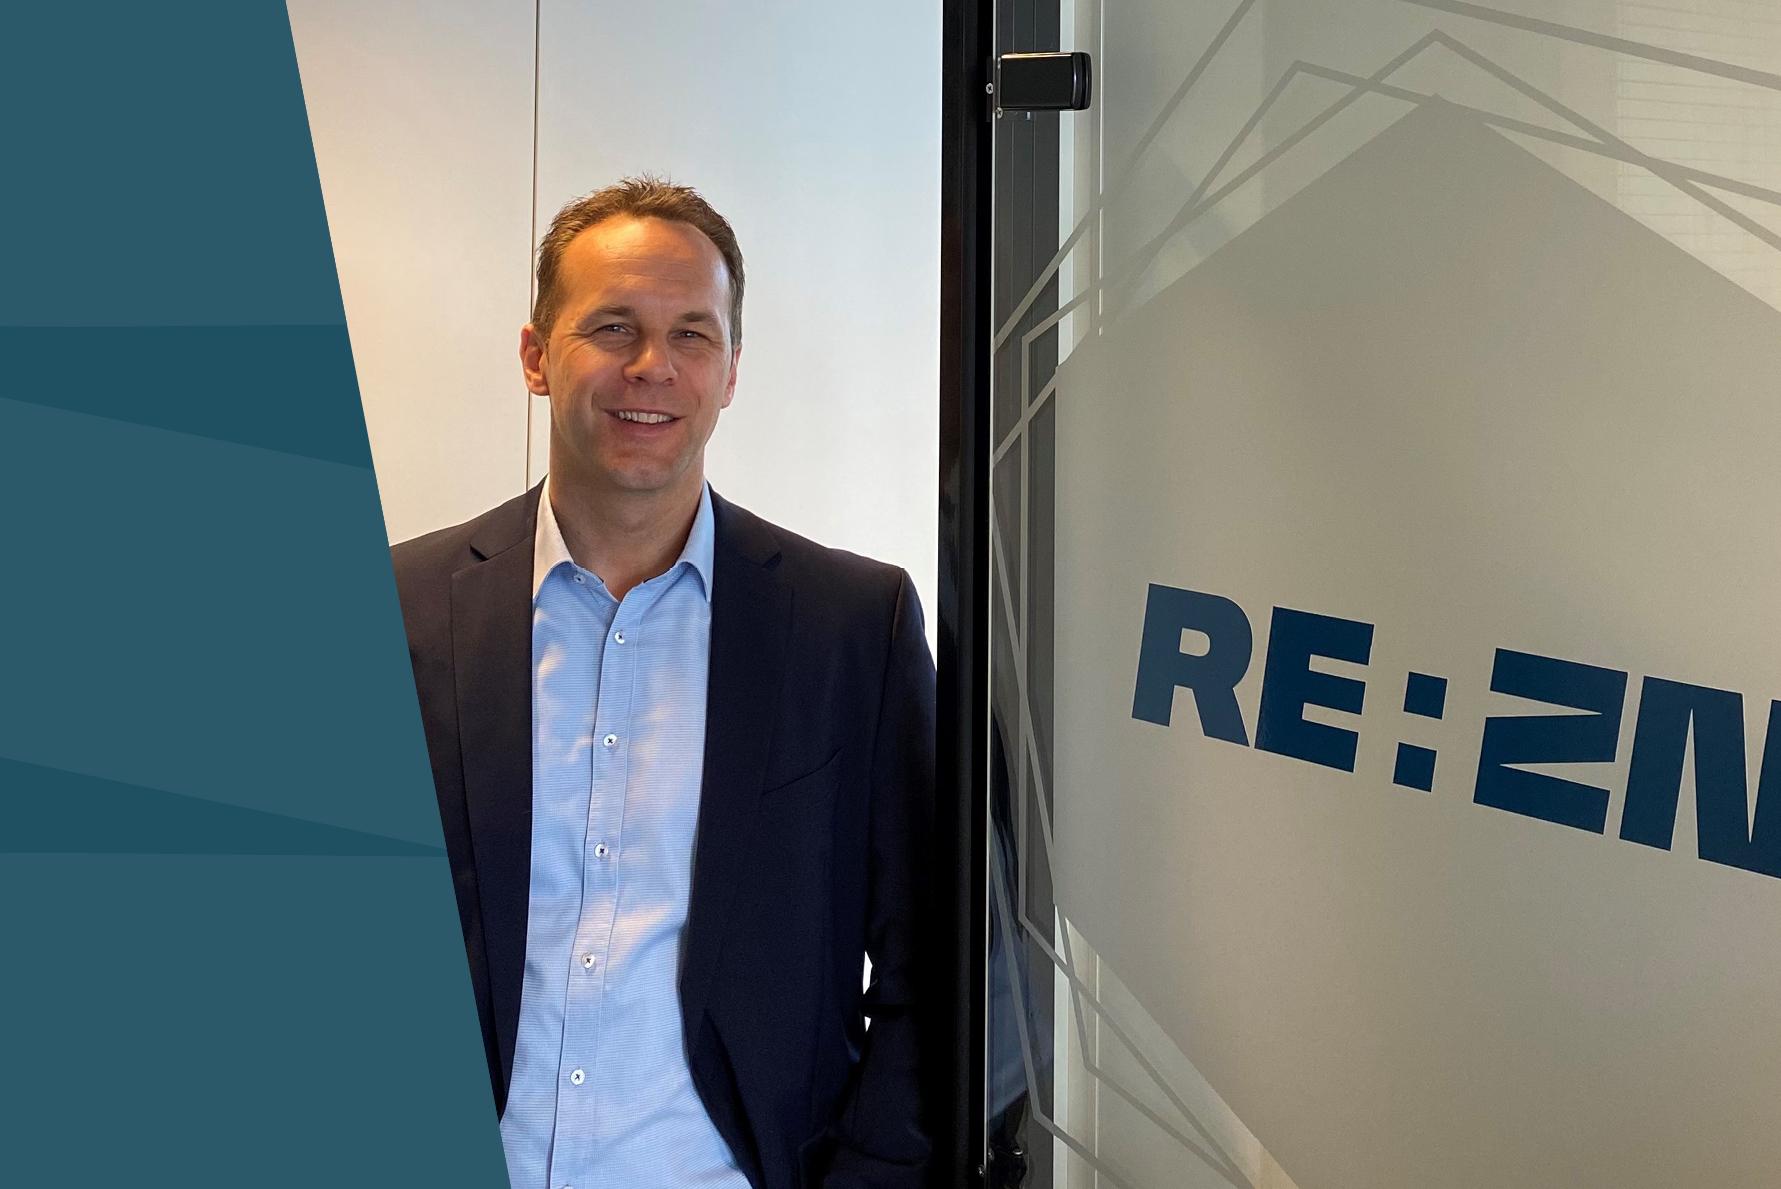 MEET THE TEAM: Introducing Stefan Schmeisser